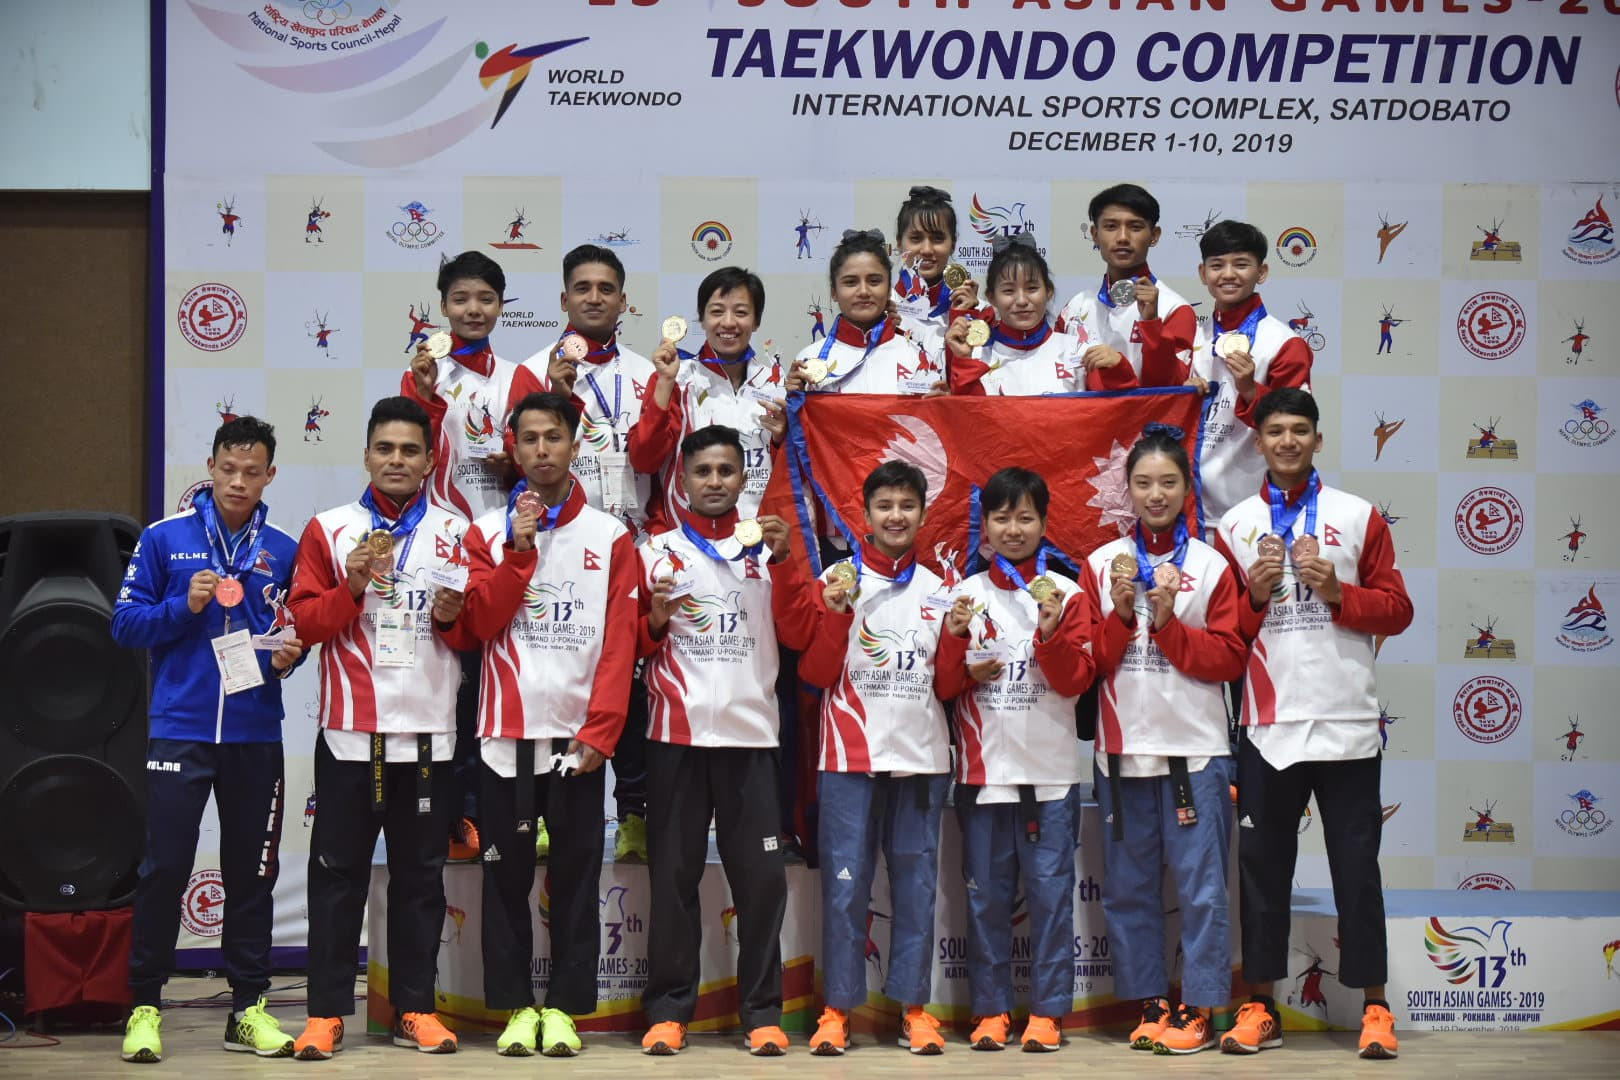 तेक्वान्दोका स्वर्ण विजेता खेलाडीहरू ।